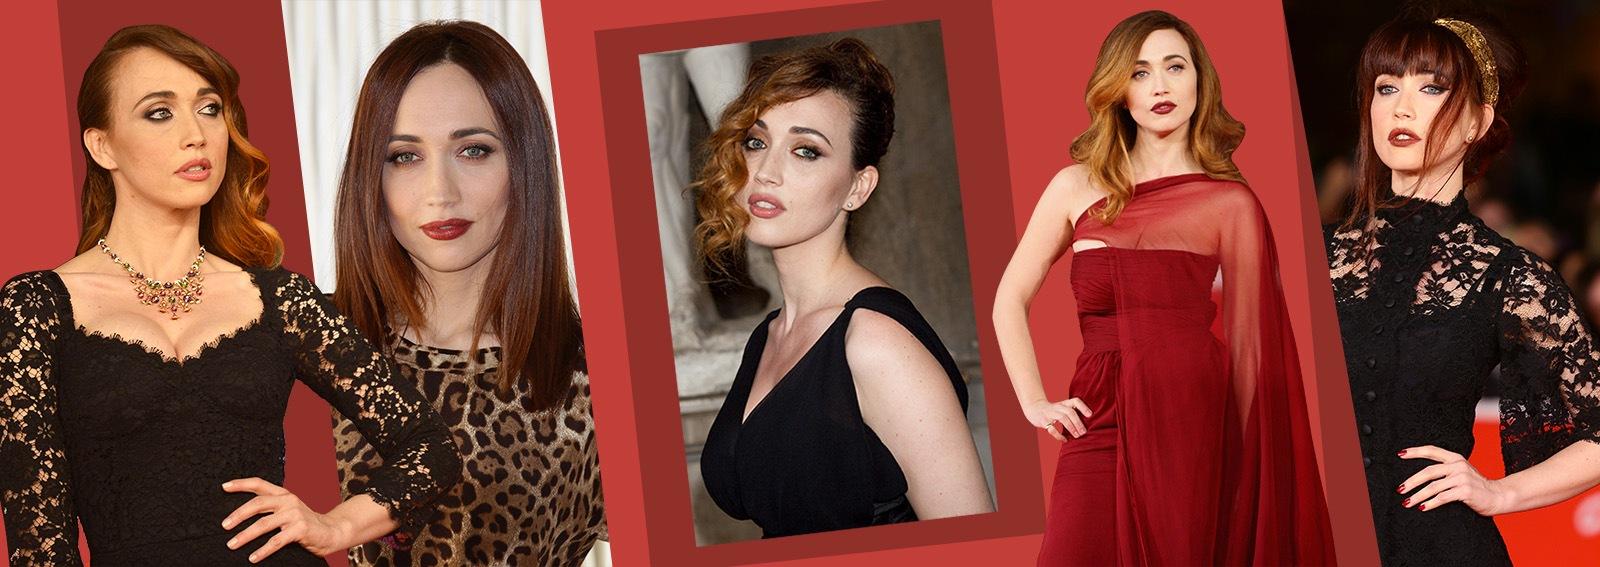 chiara francini trucco capelli beauty look collage_desktop